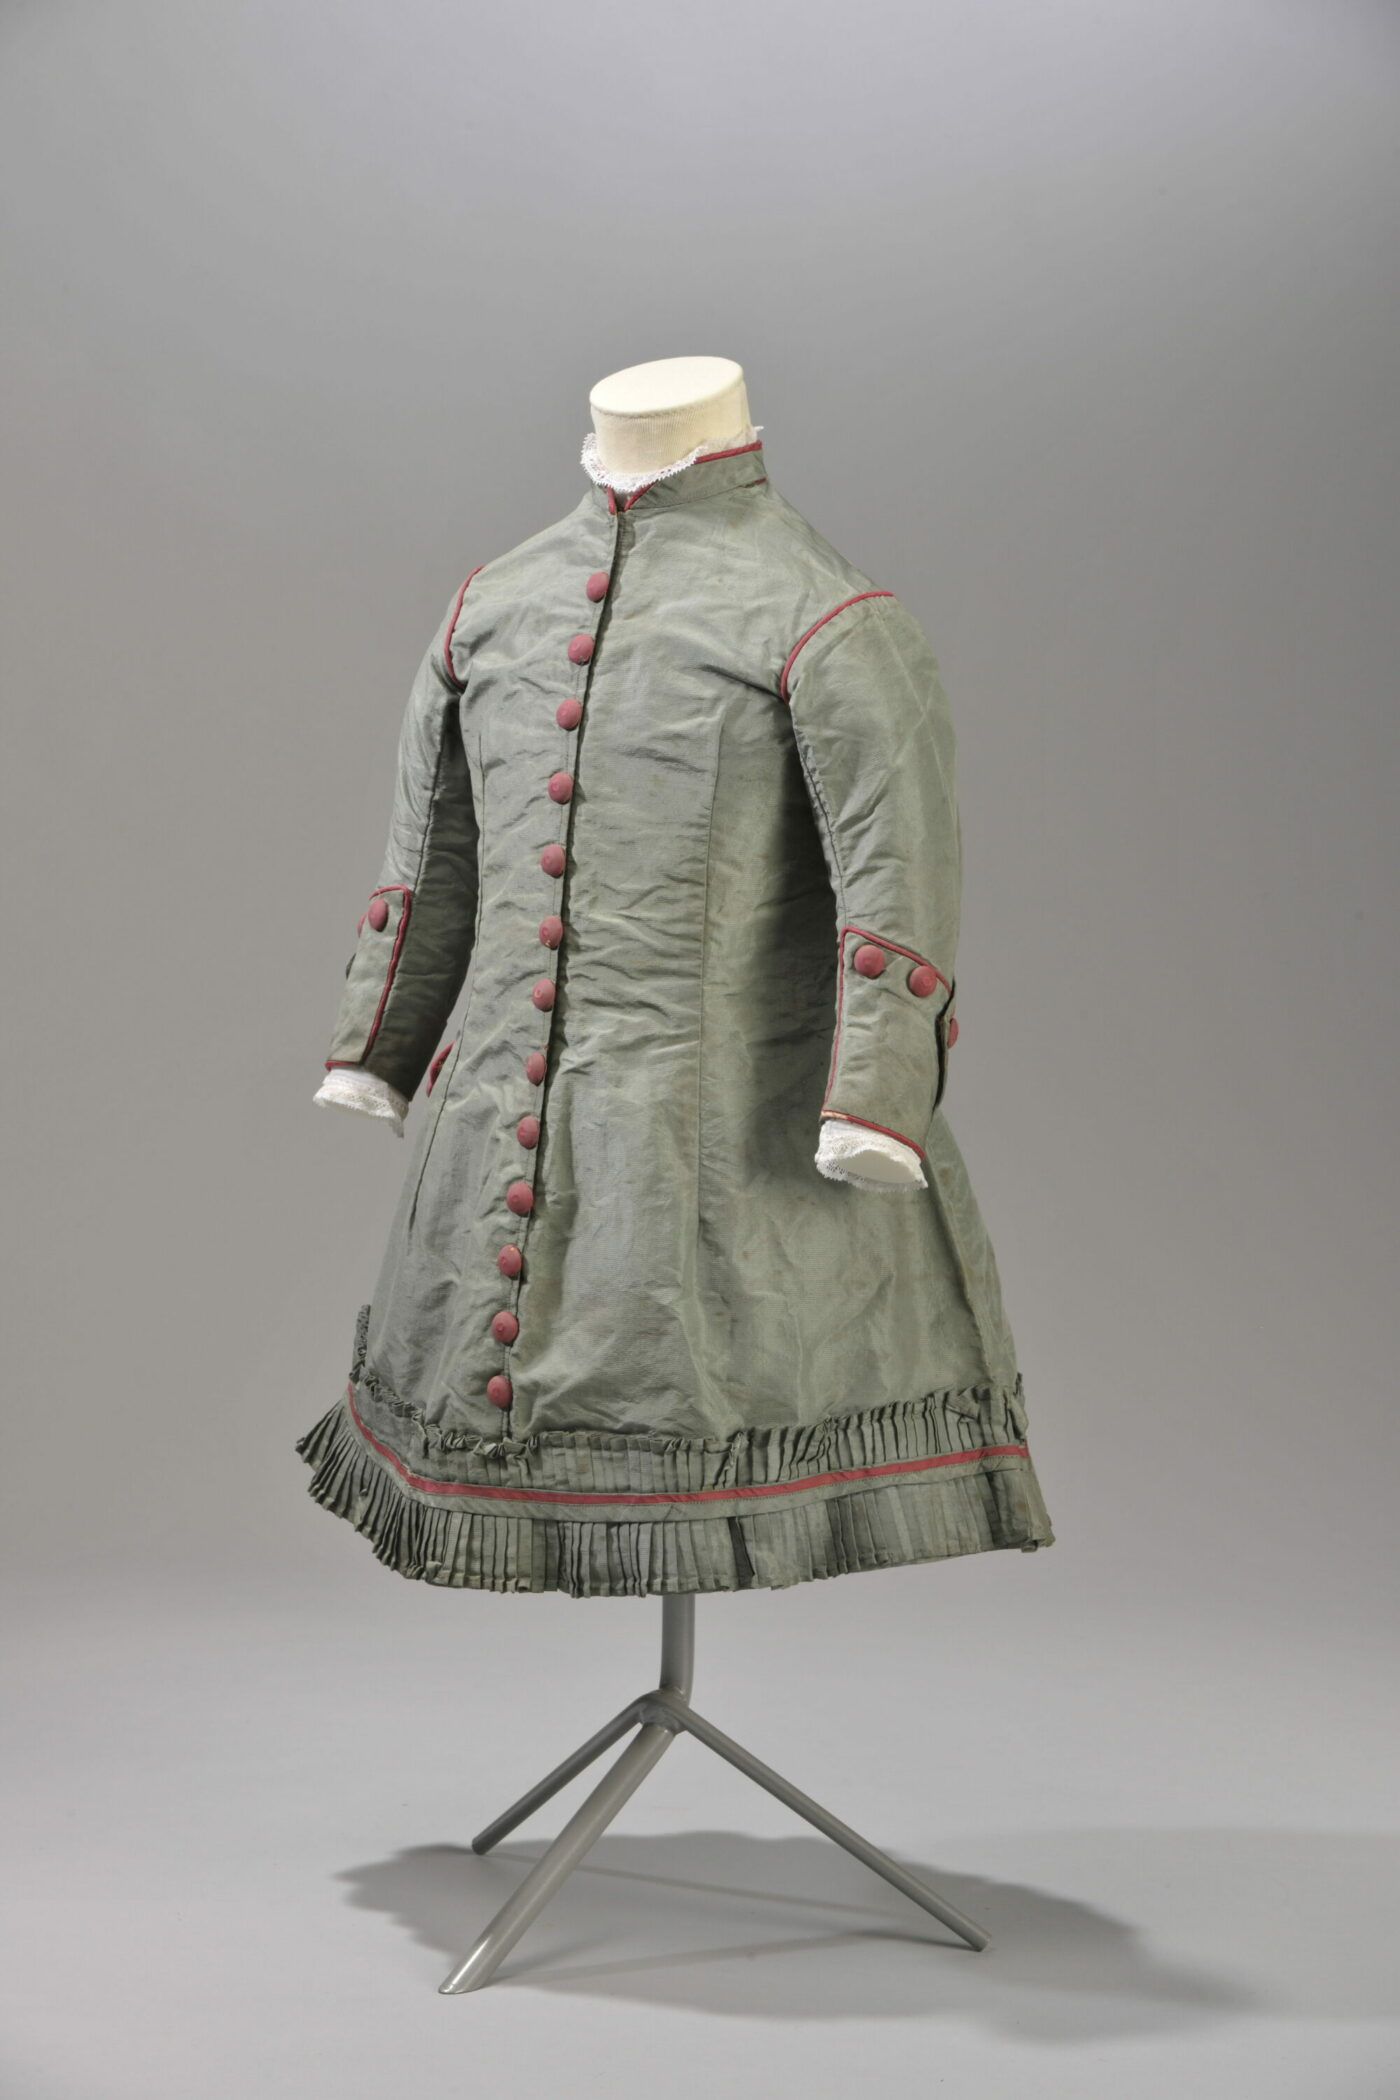 Fig. 3 Green silk boy's dress with burgundy finishes, 1870-80. Modemuseum Hasselt © Modemuseum Hasselt/Frank Gielen